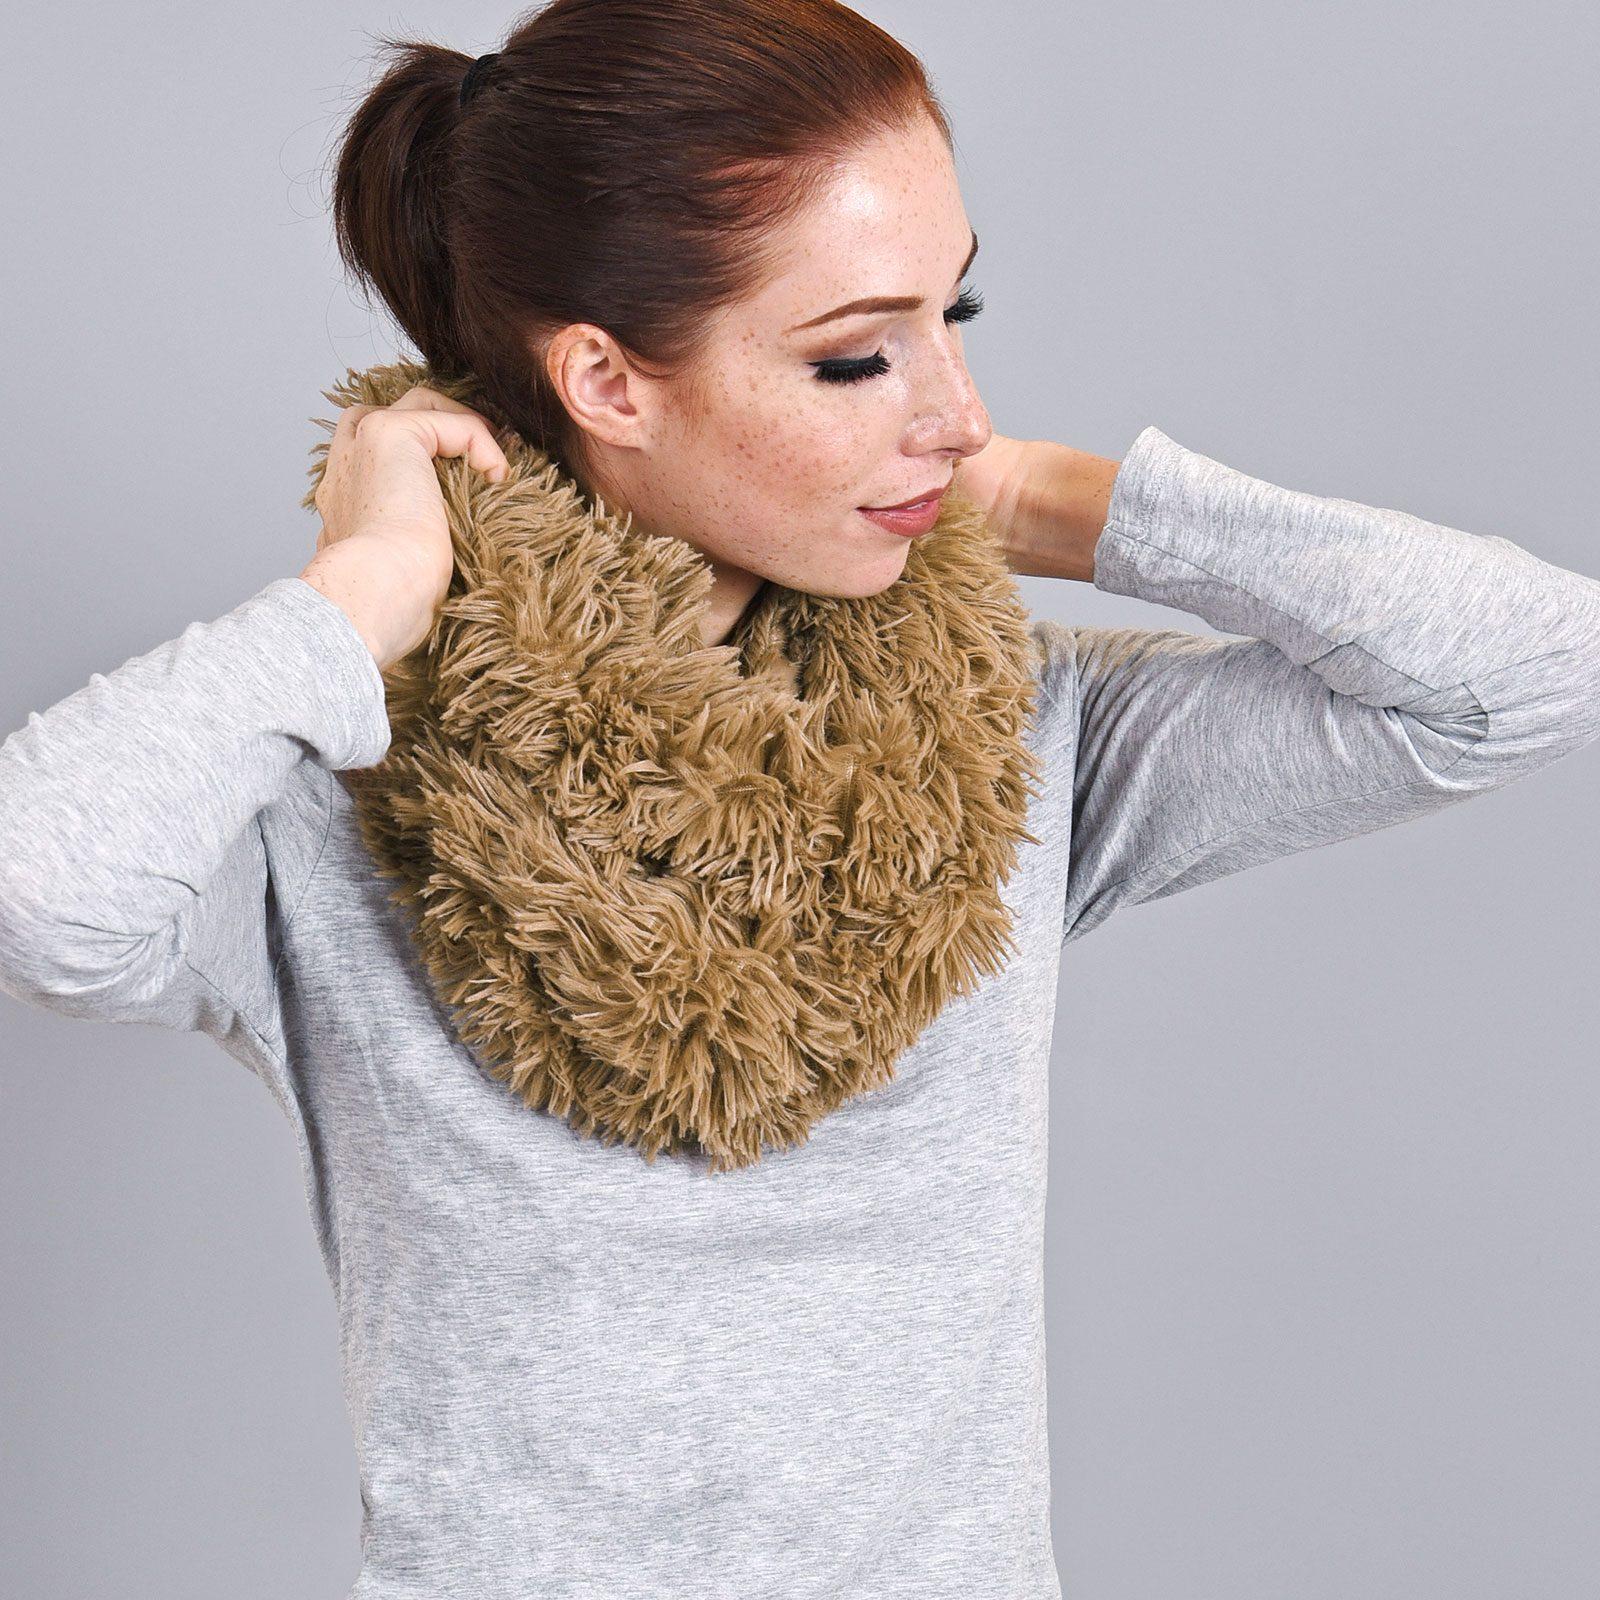 http://lookbook.allee-du-foulard.fr/wp-content/uploads/2019/01/AT-03325-VF16-snood-pilou-taupe-1600x1600.jpg